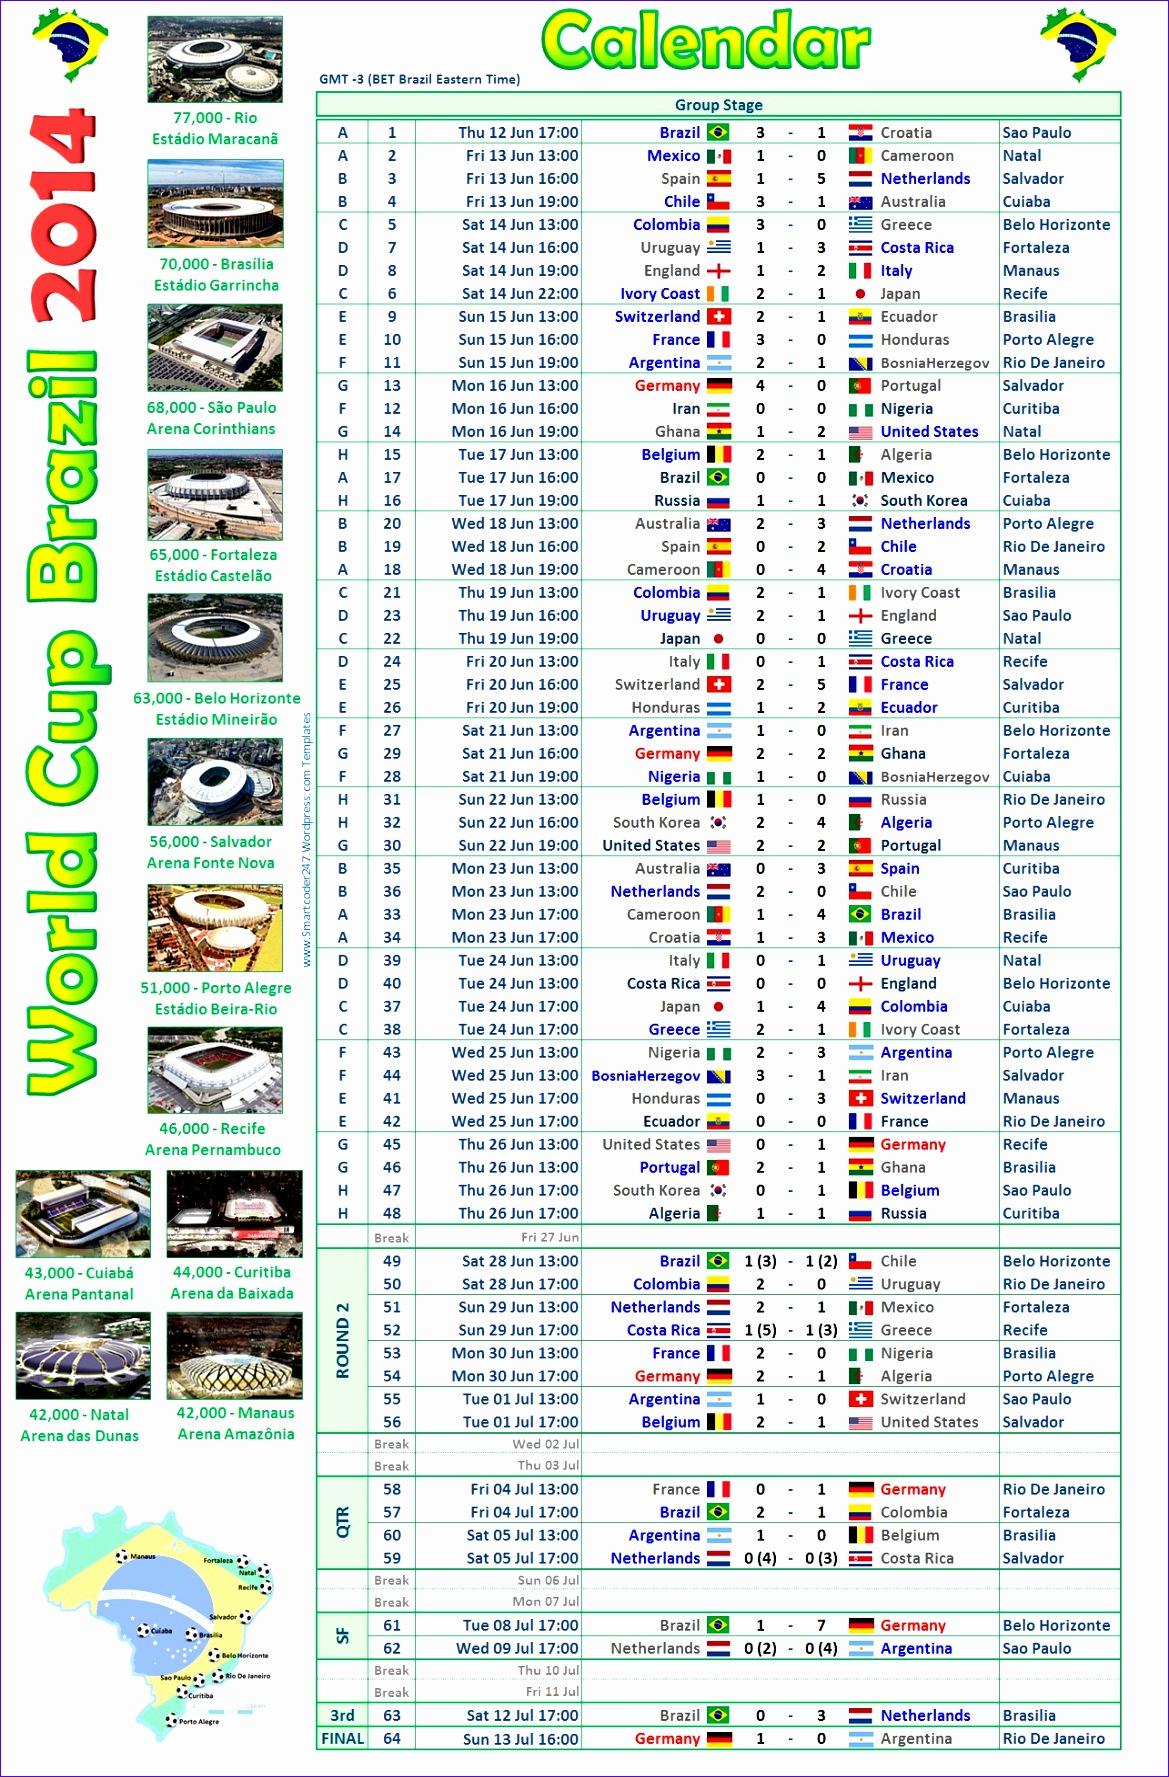 excel 2003 calendar template chsbk unique fifa world cup 2014 excel chart 12851932